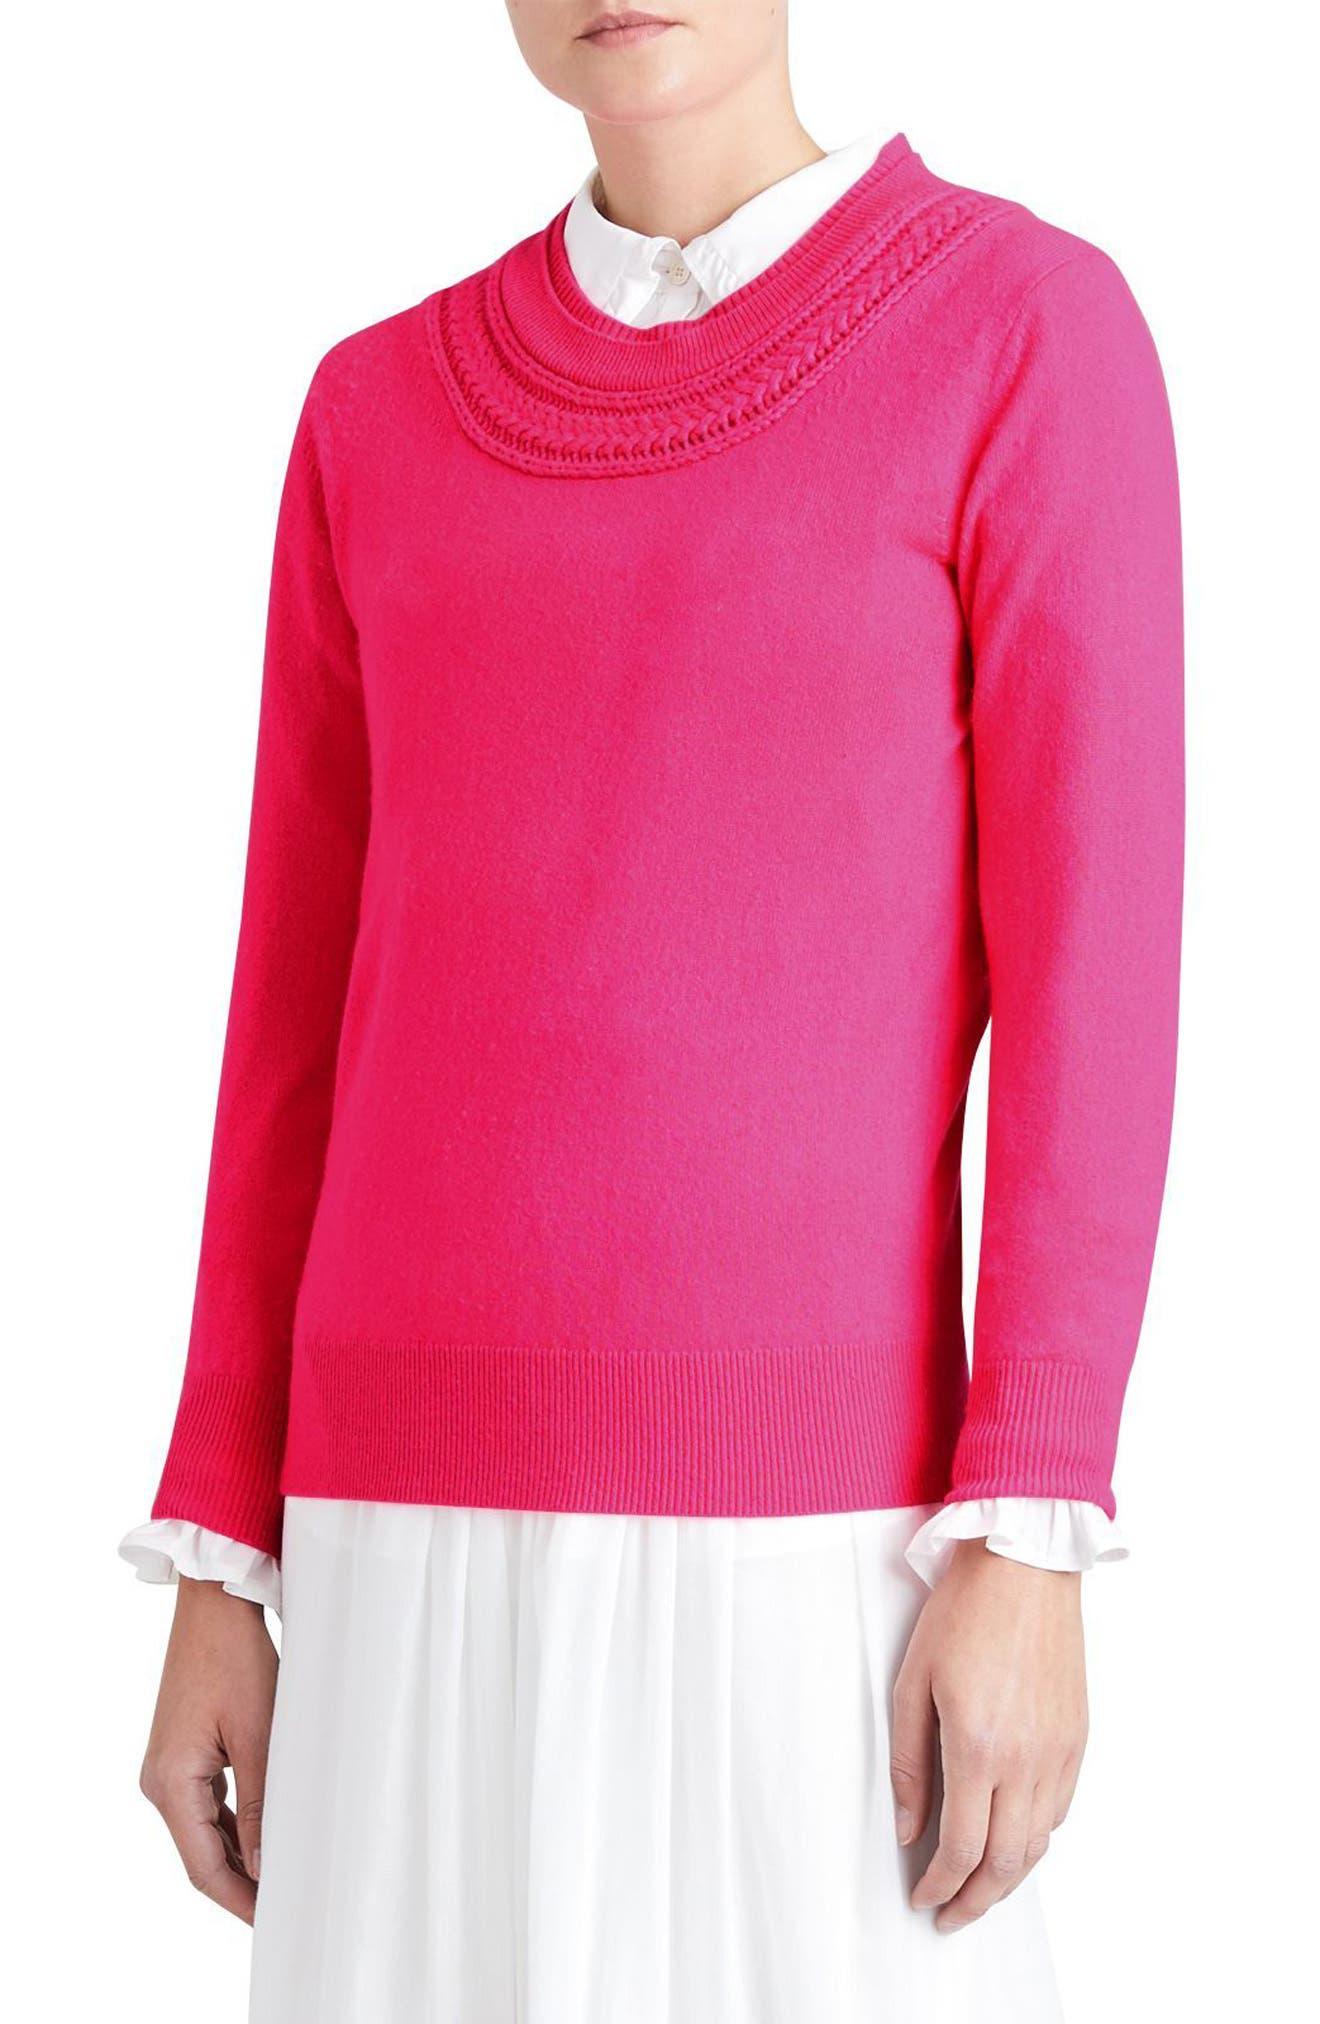 Guadaira Cashmere Sweater,                             Alternate thumbnail 3, color,                             671